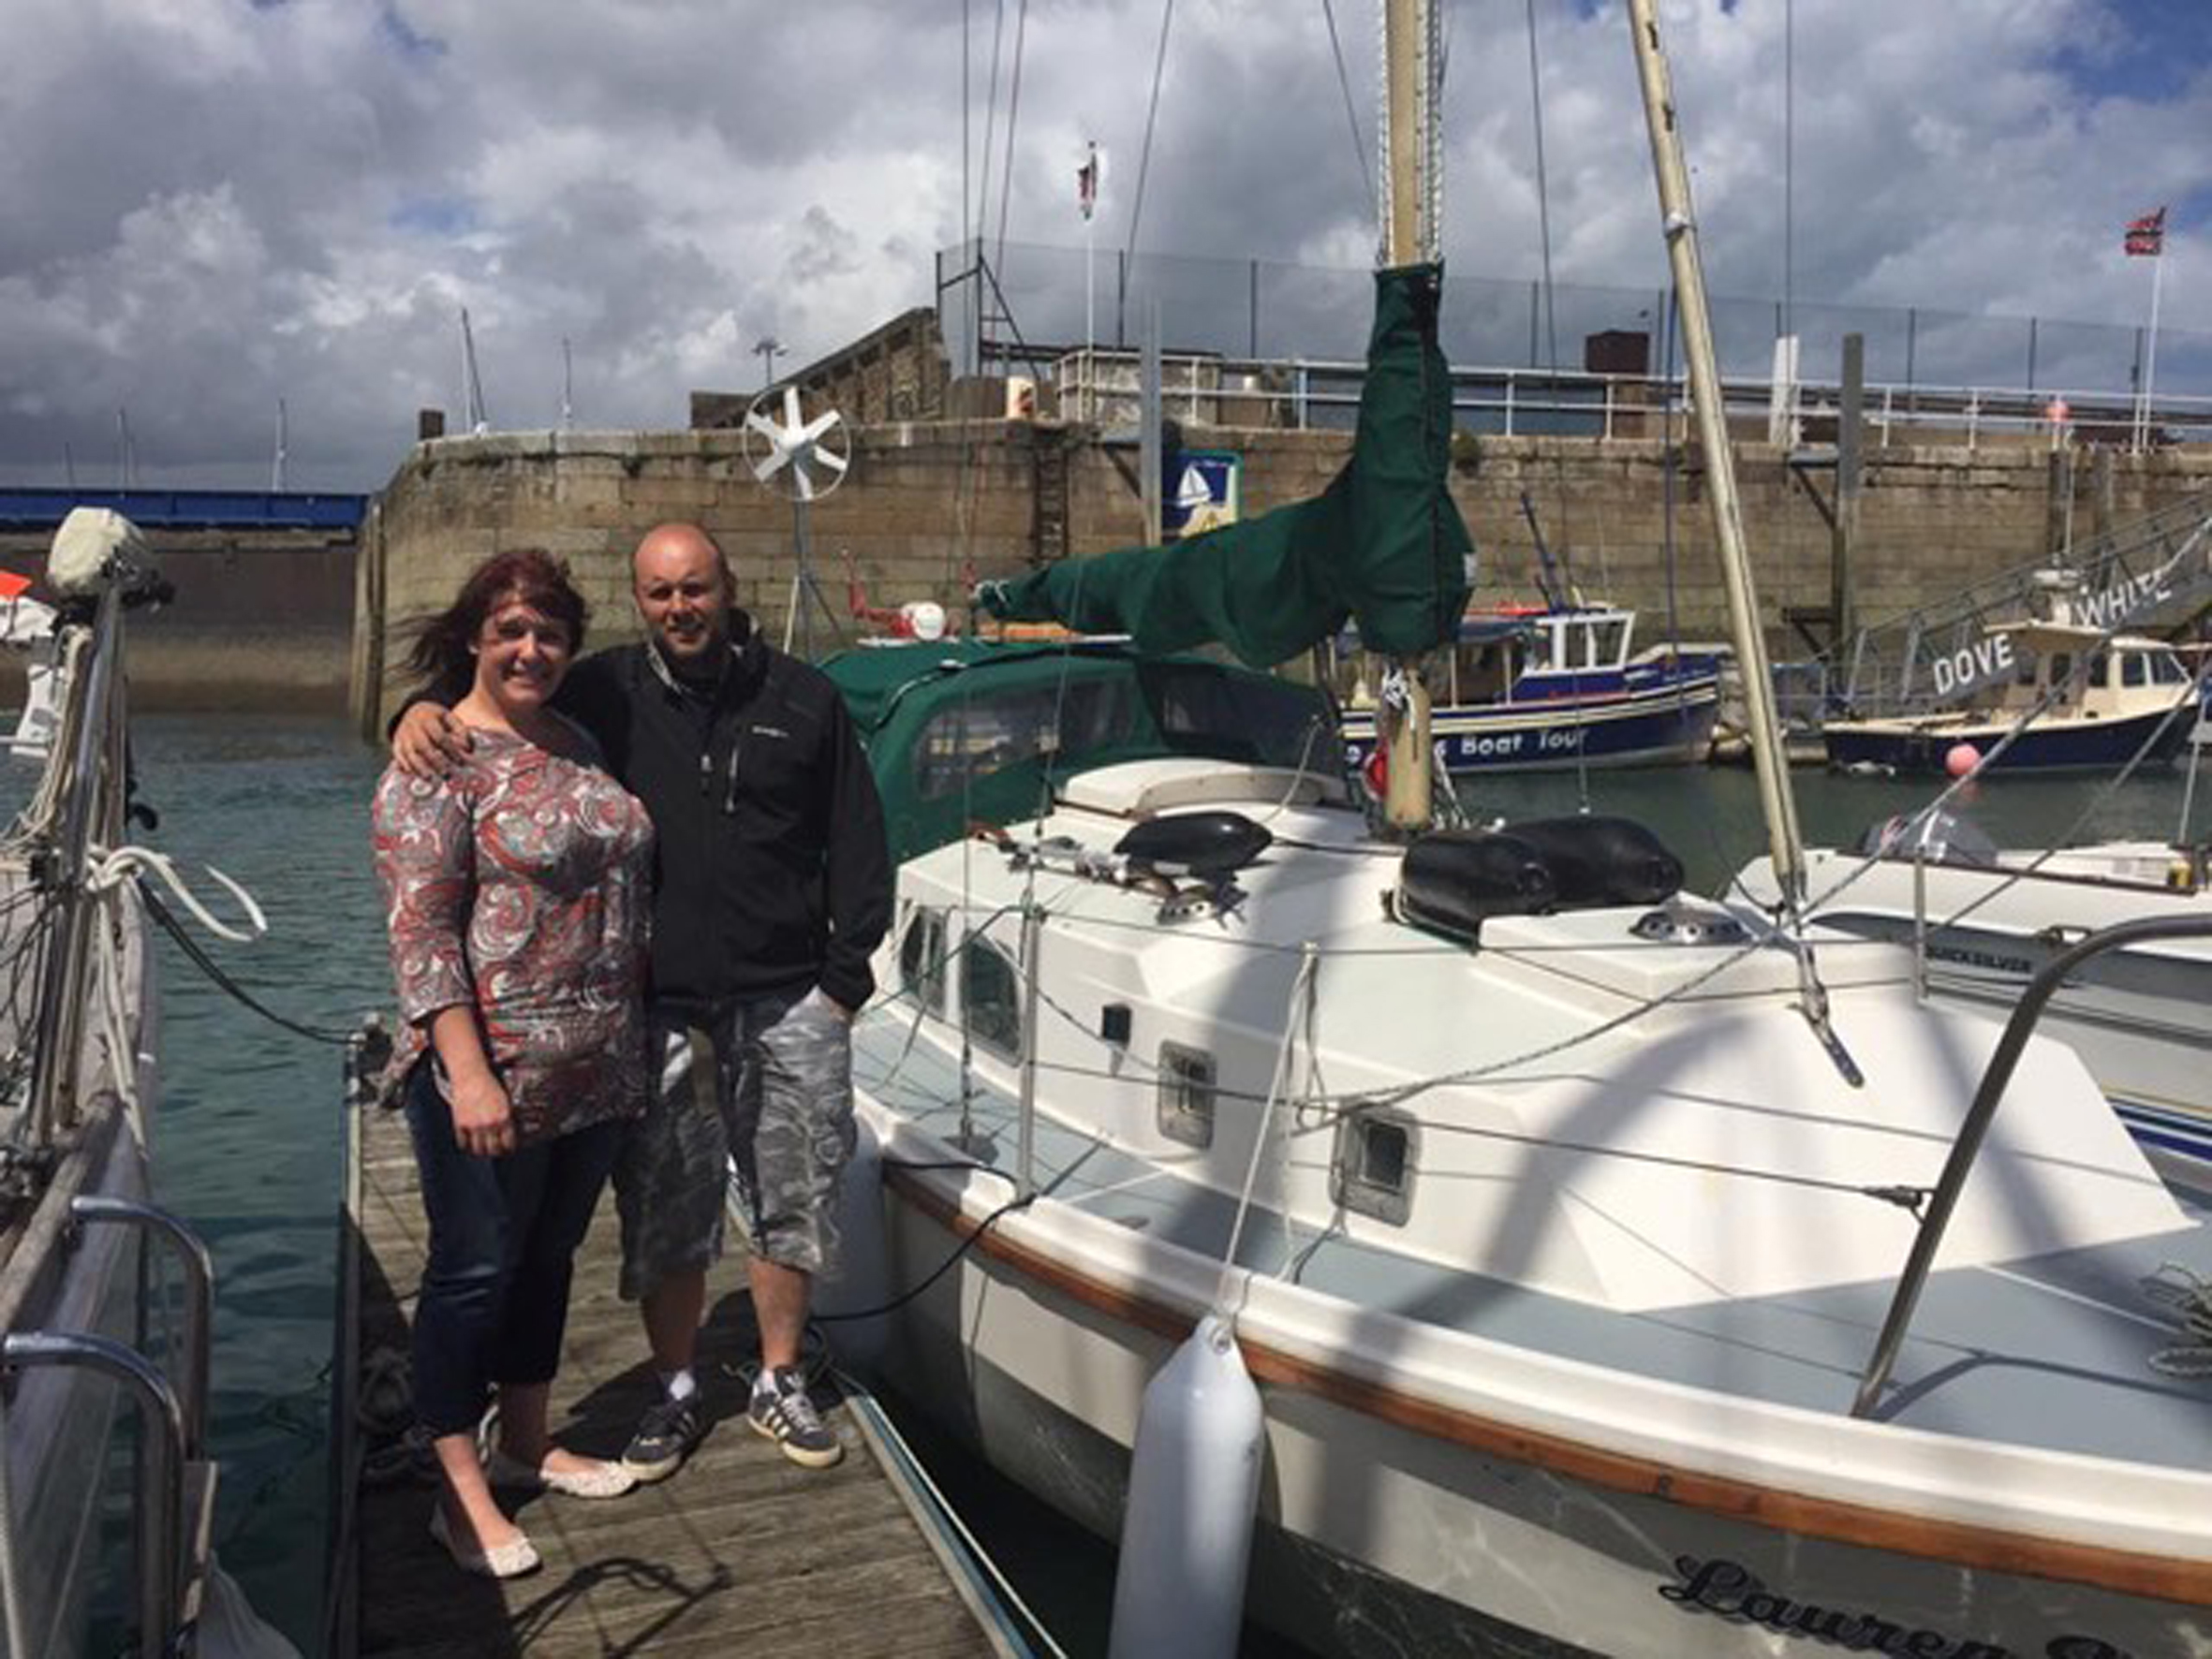 Brian Munro with his partner Lisa Strachan alongside the Lauren Sophia.